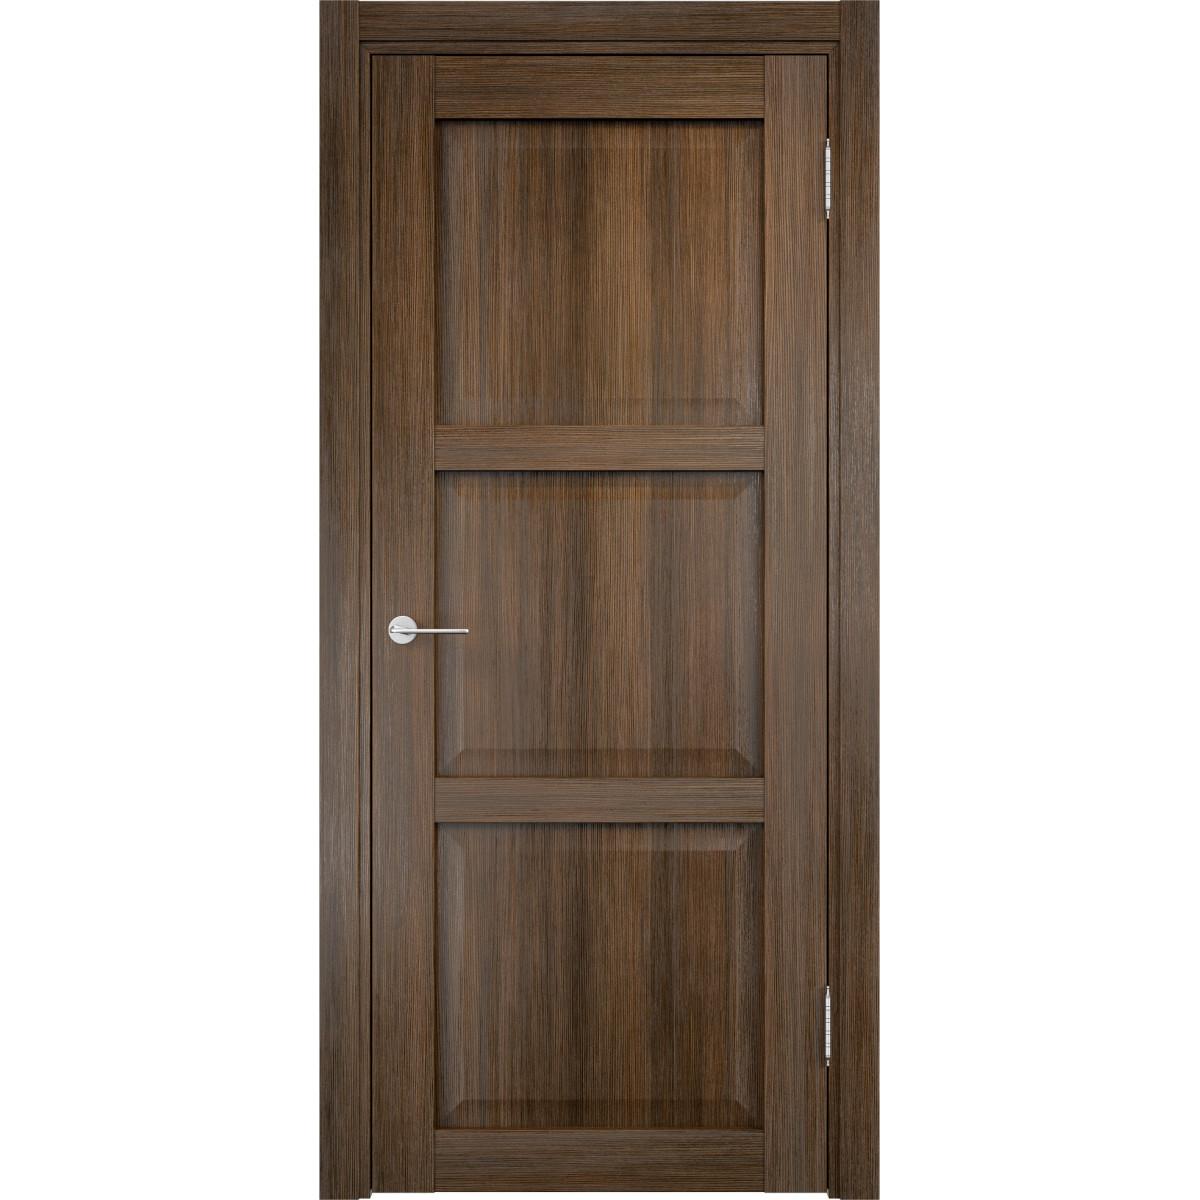 Дверное полотно Casaporte Рома МП_0106 2000х600х44 мм МДФ